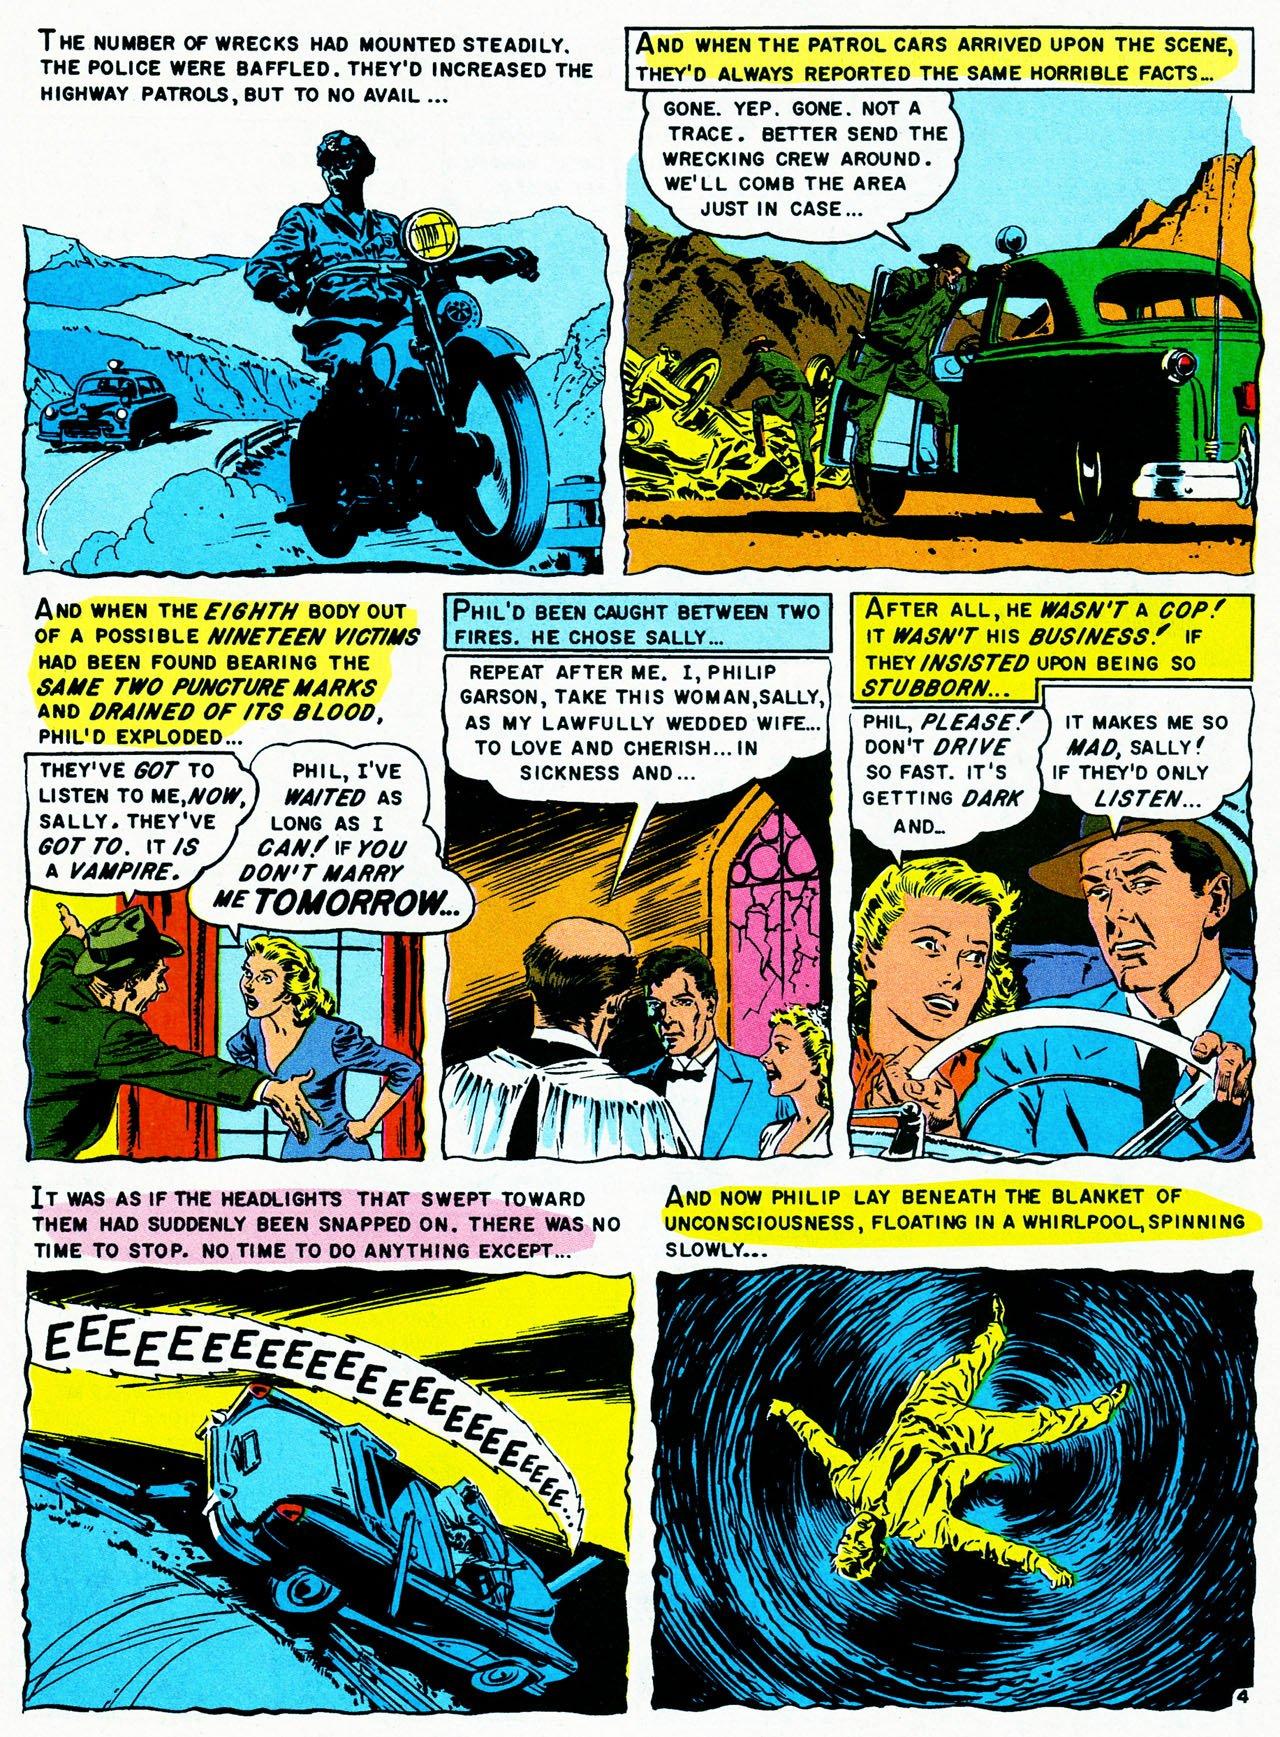 Read online Shock SuspenStories comic -  Issue #10 - 30